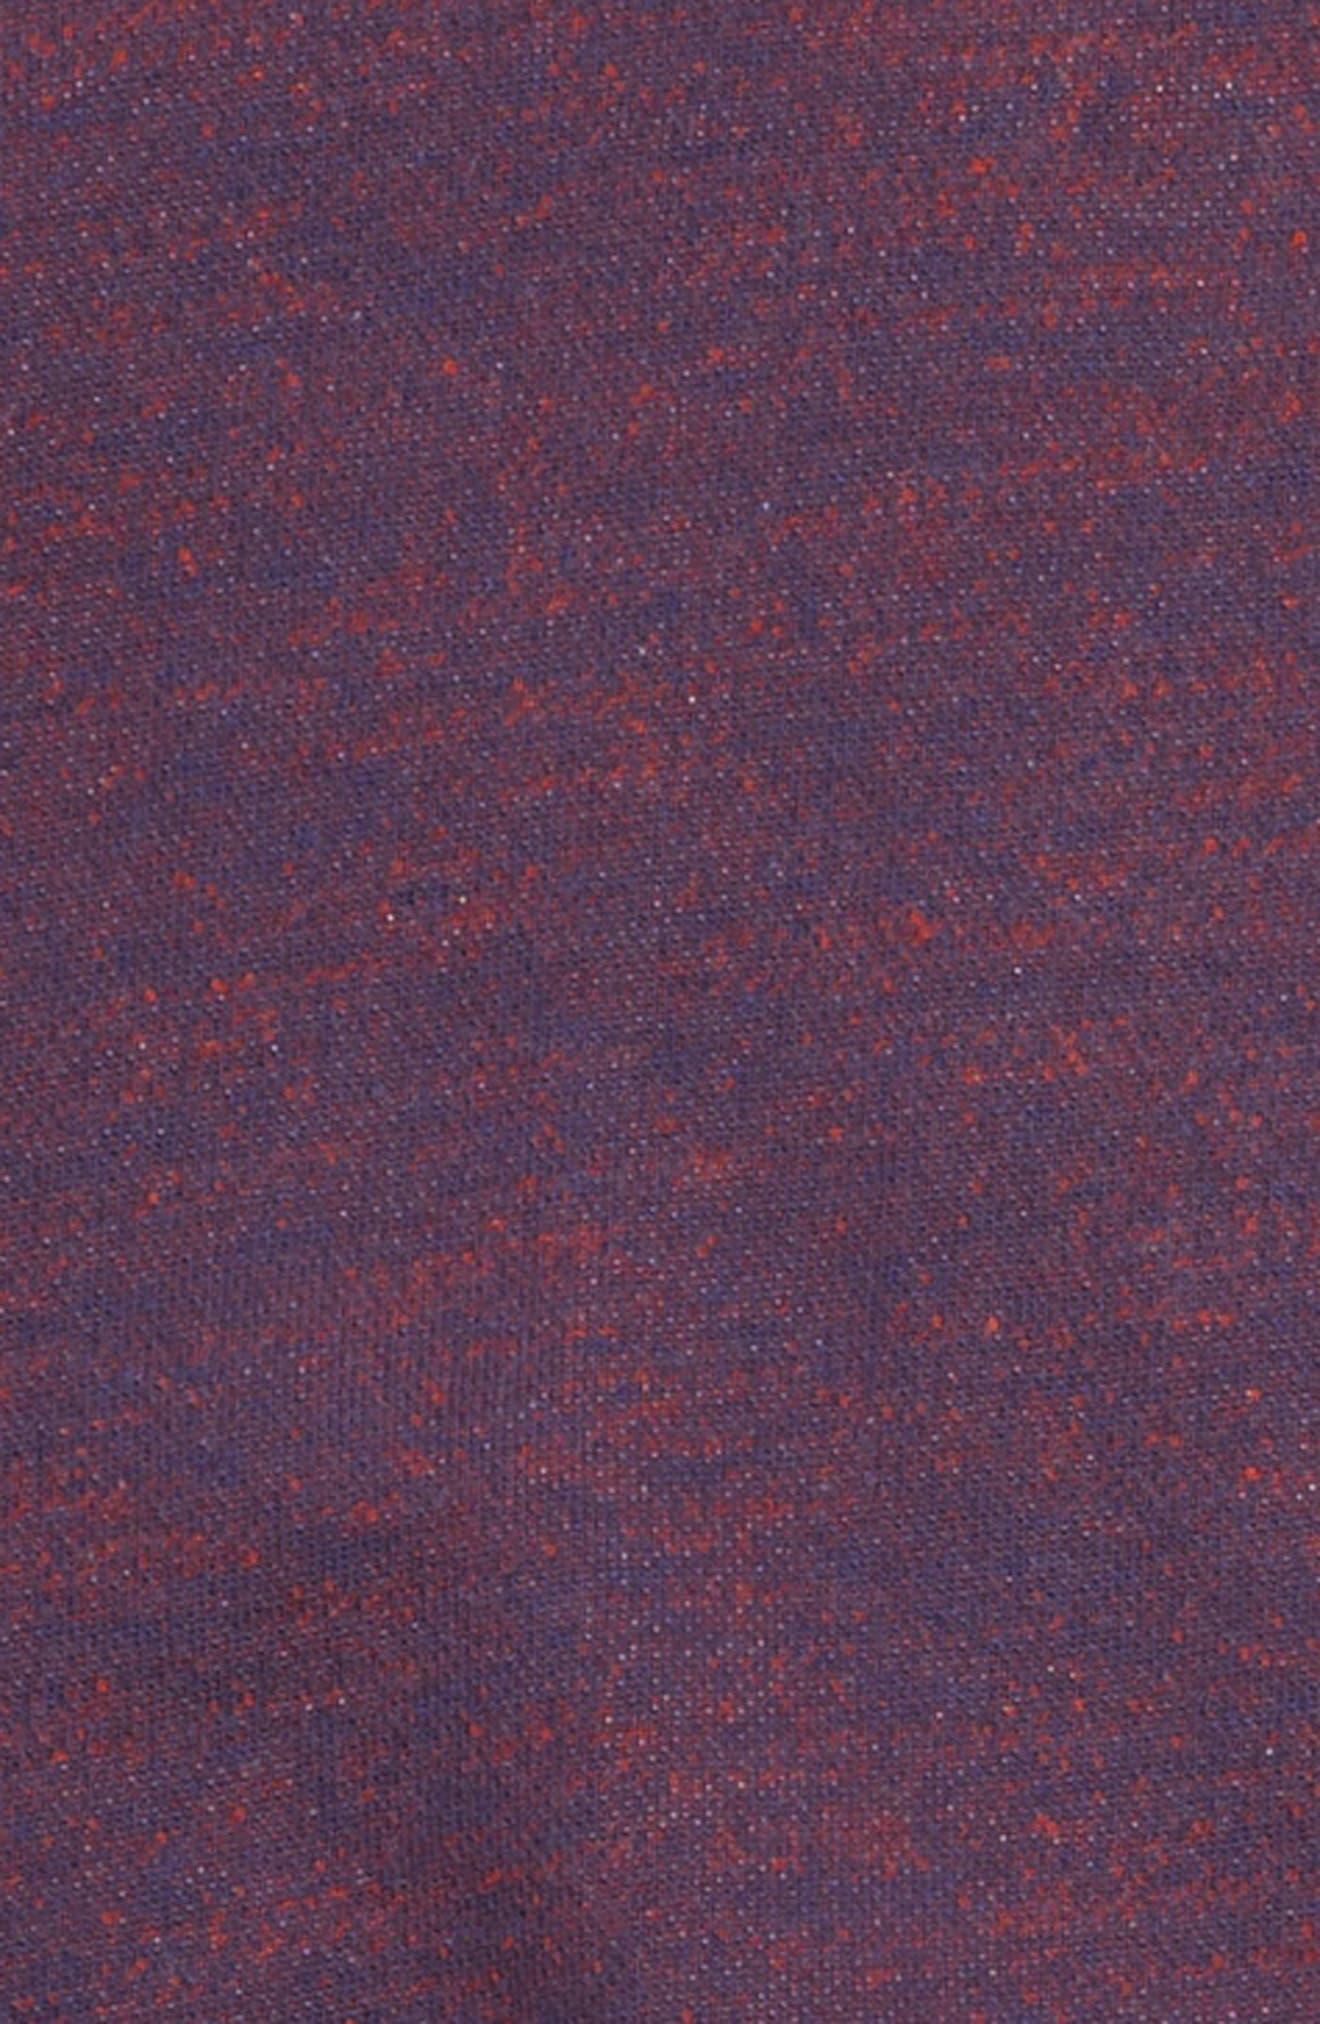 Crewneck Sweatshirt,                             Alternate thumbnail 2, color,                             410